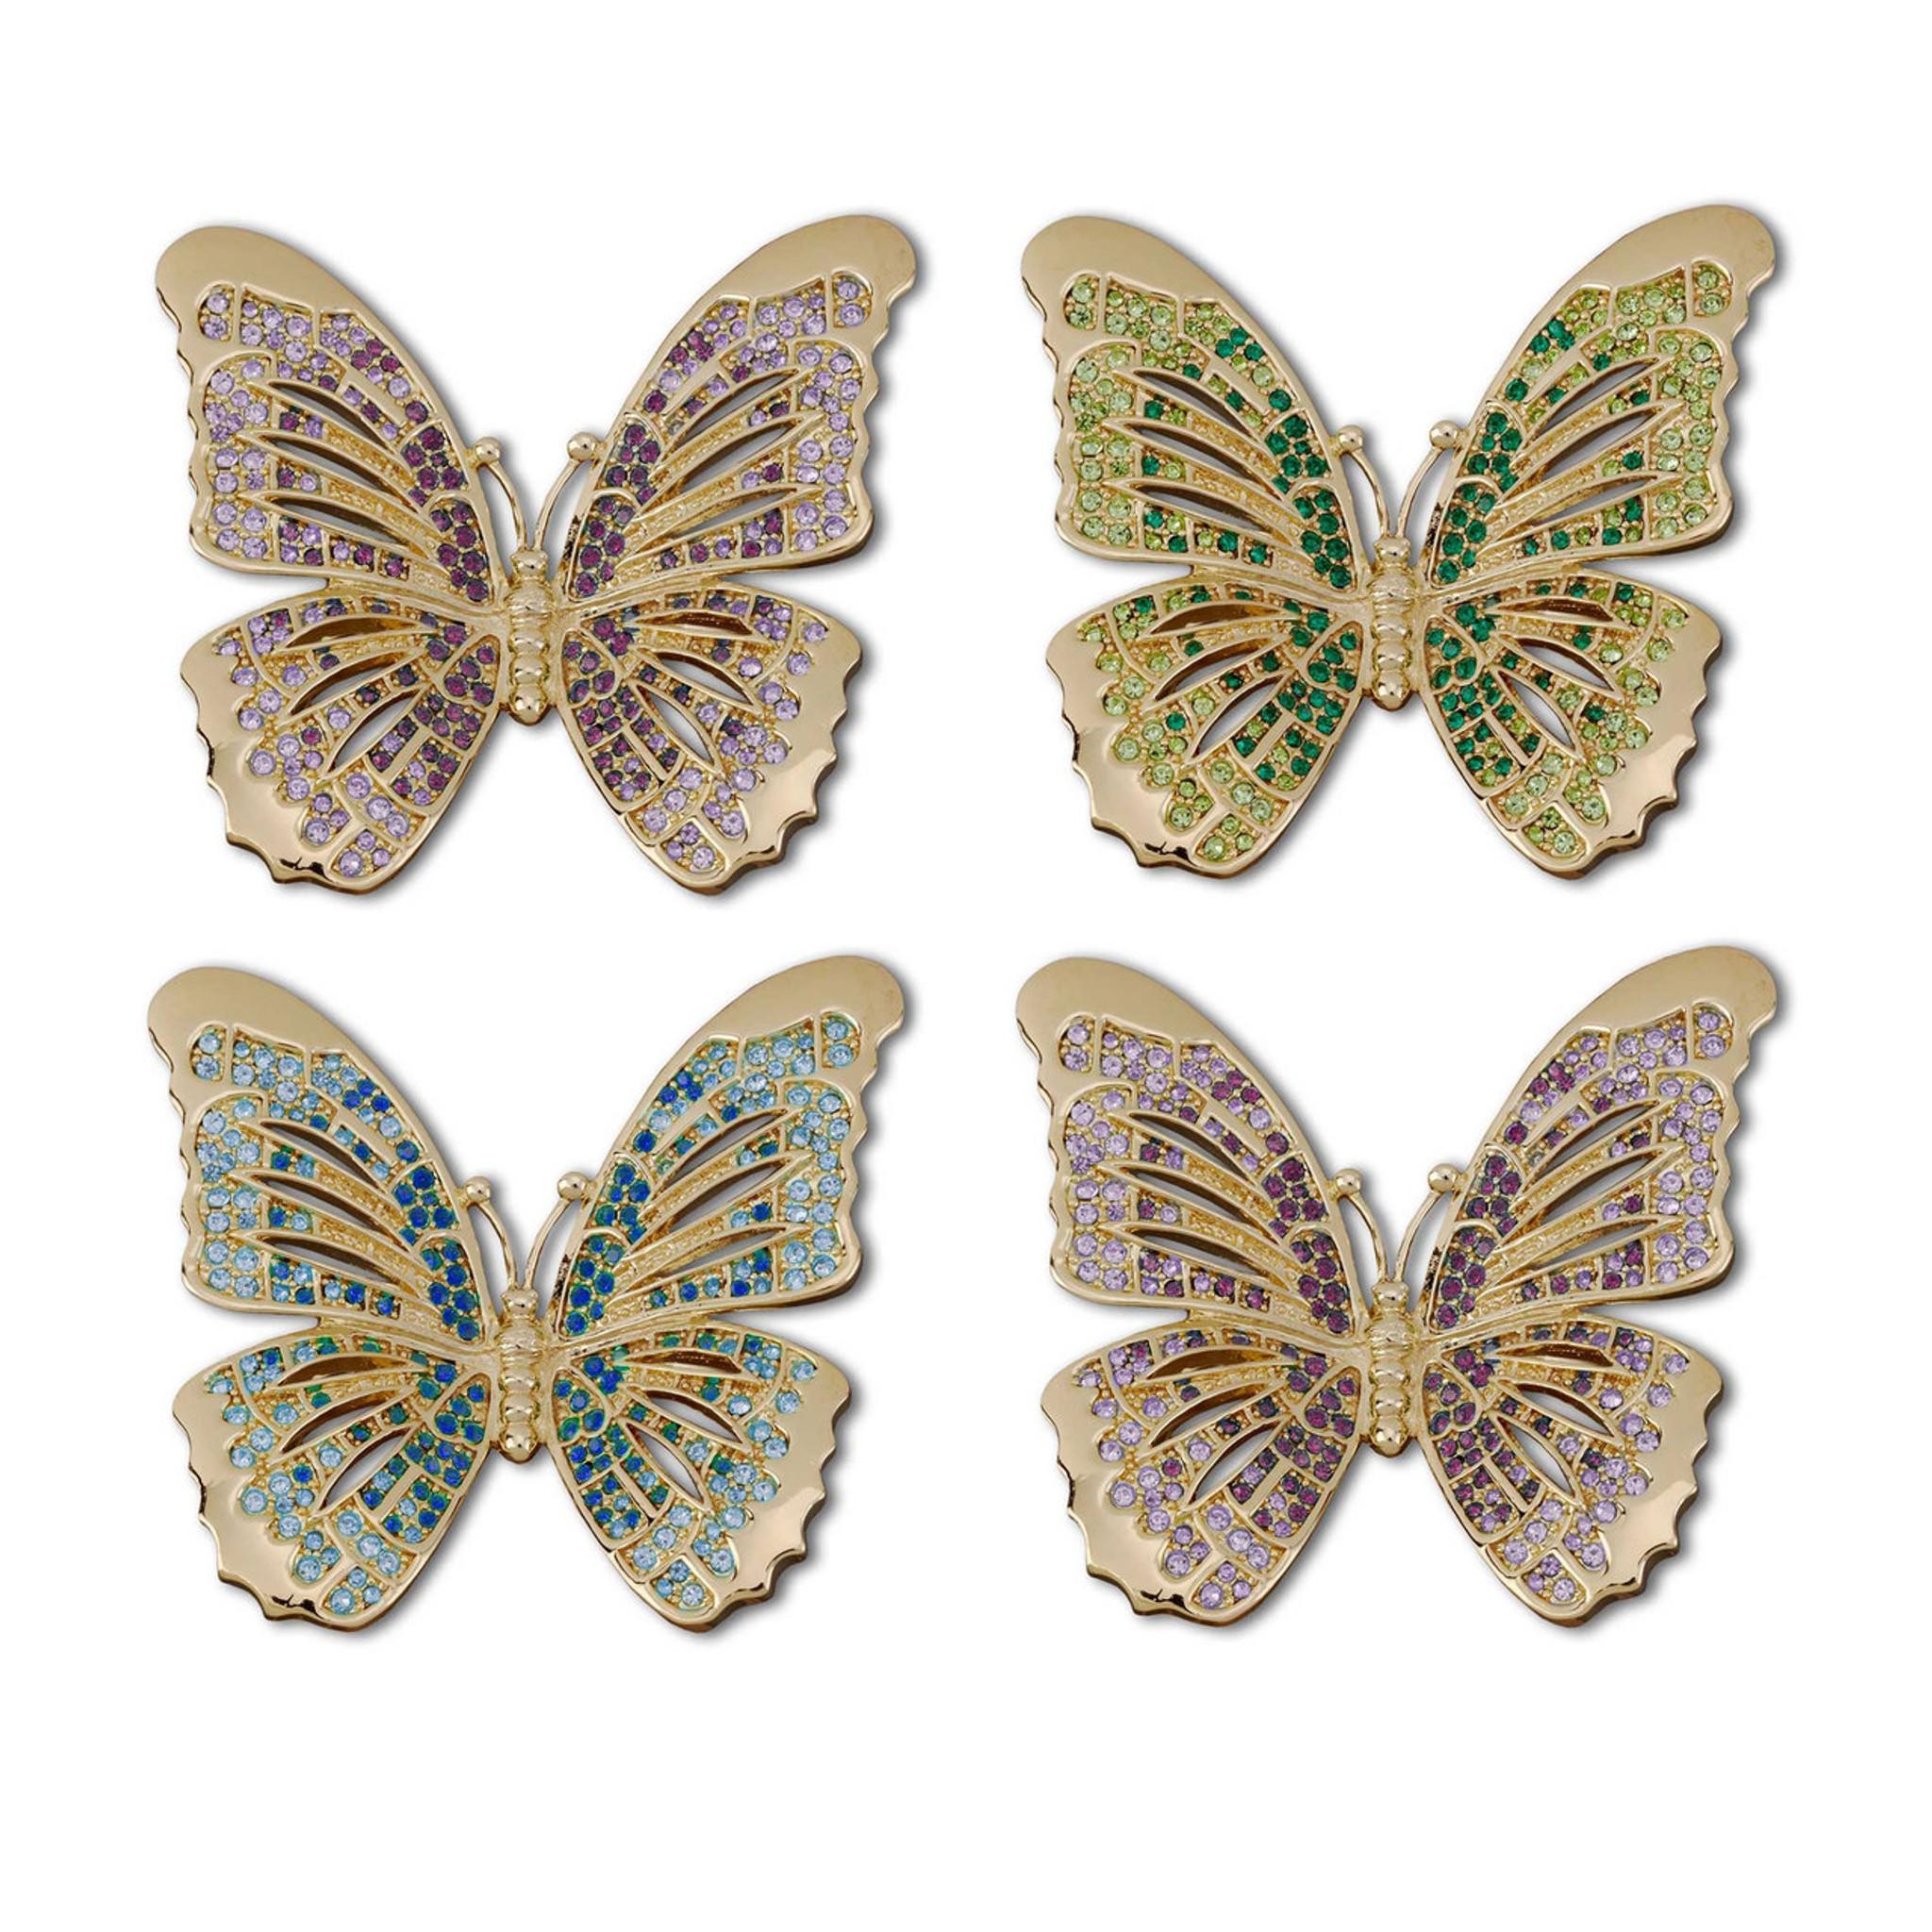 L Objet Butterfly Napkin Rings Gold Multi Color Crystals Napkin Rings Nj9901 Homebello